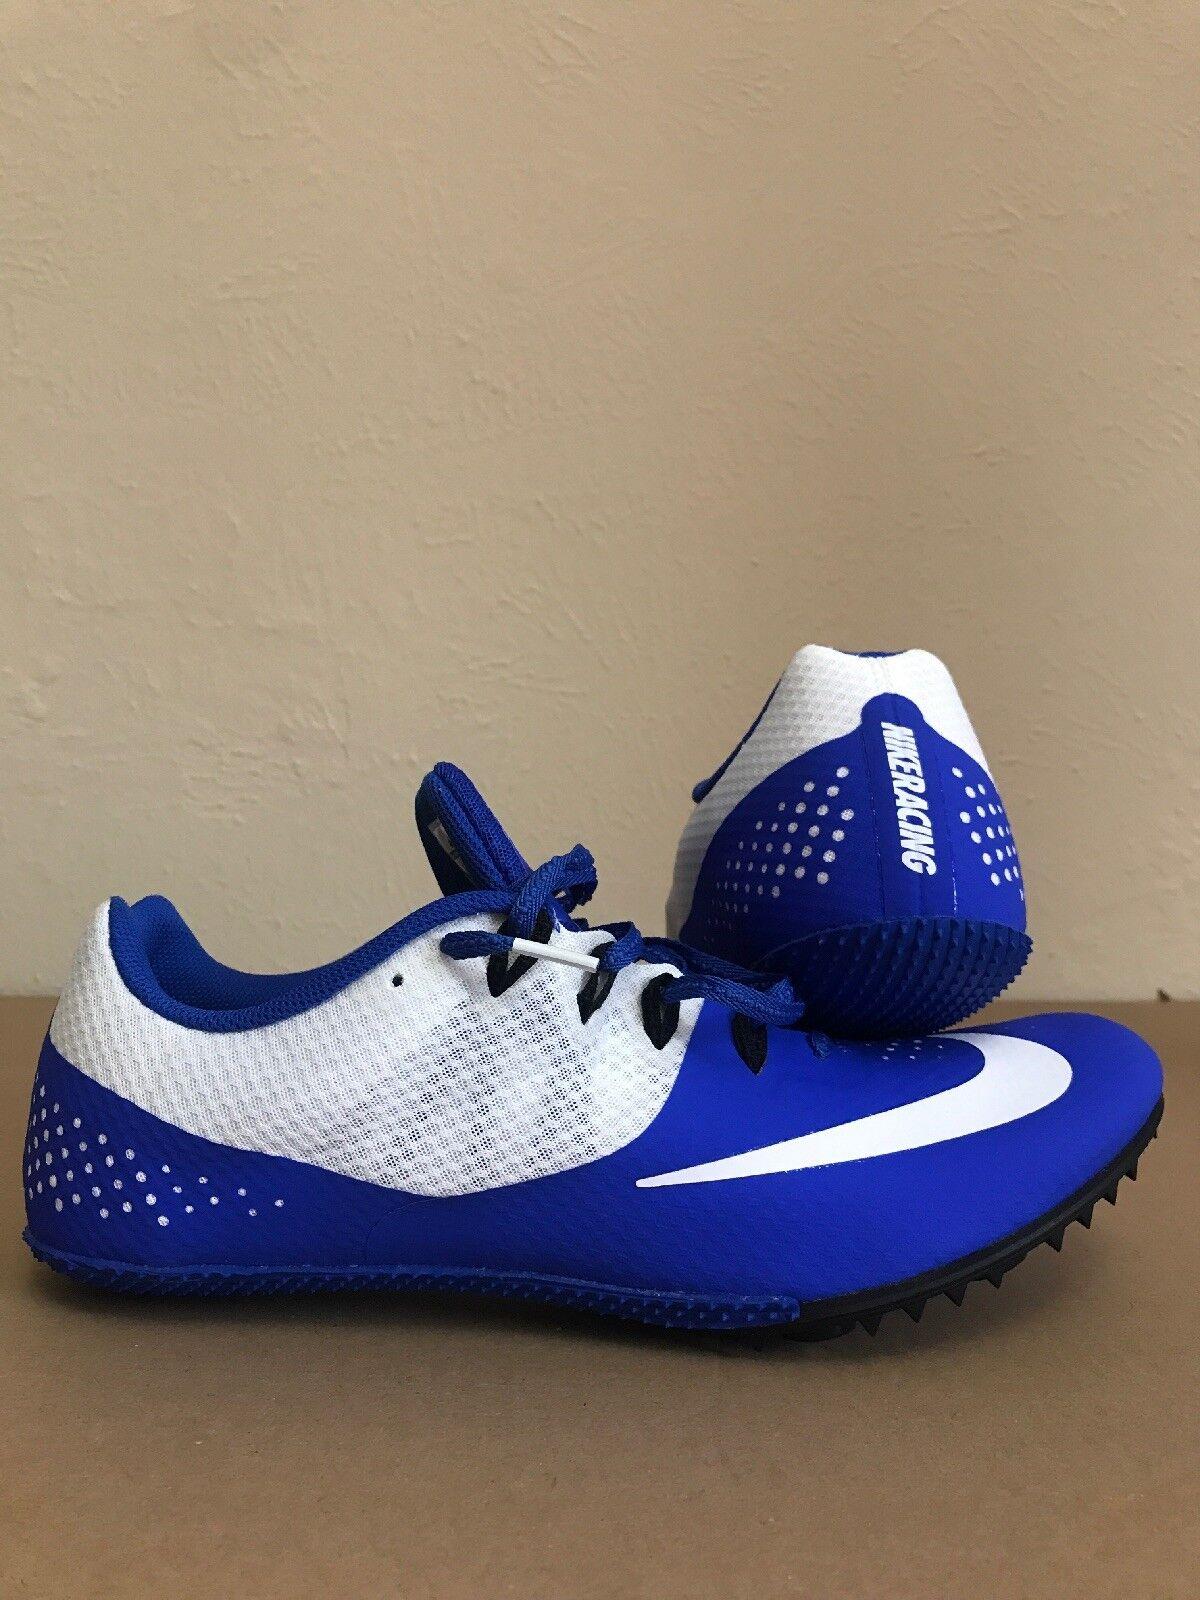 nike zoom rivale s mens pista pista pista campo spuntoni sprint scarpe blu uomo 10,5 960aa1